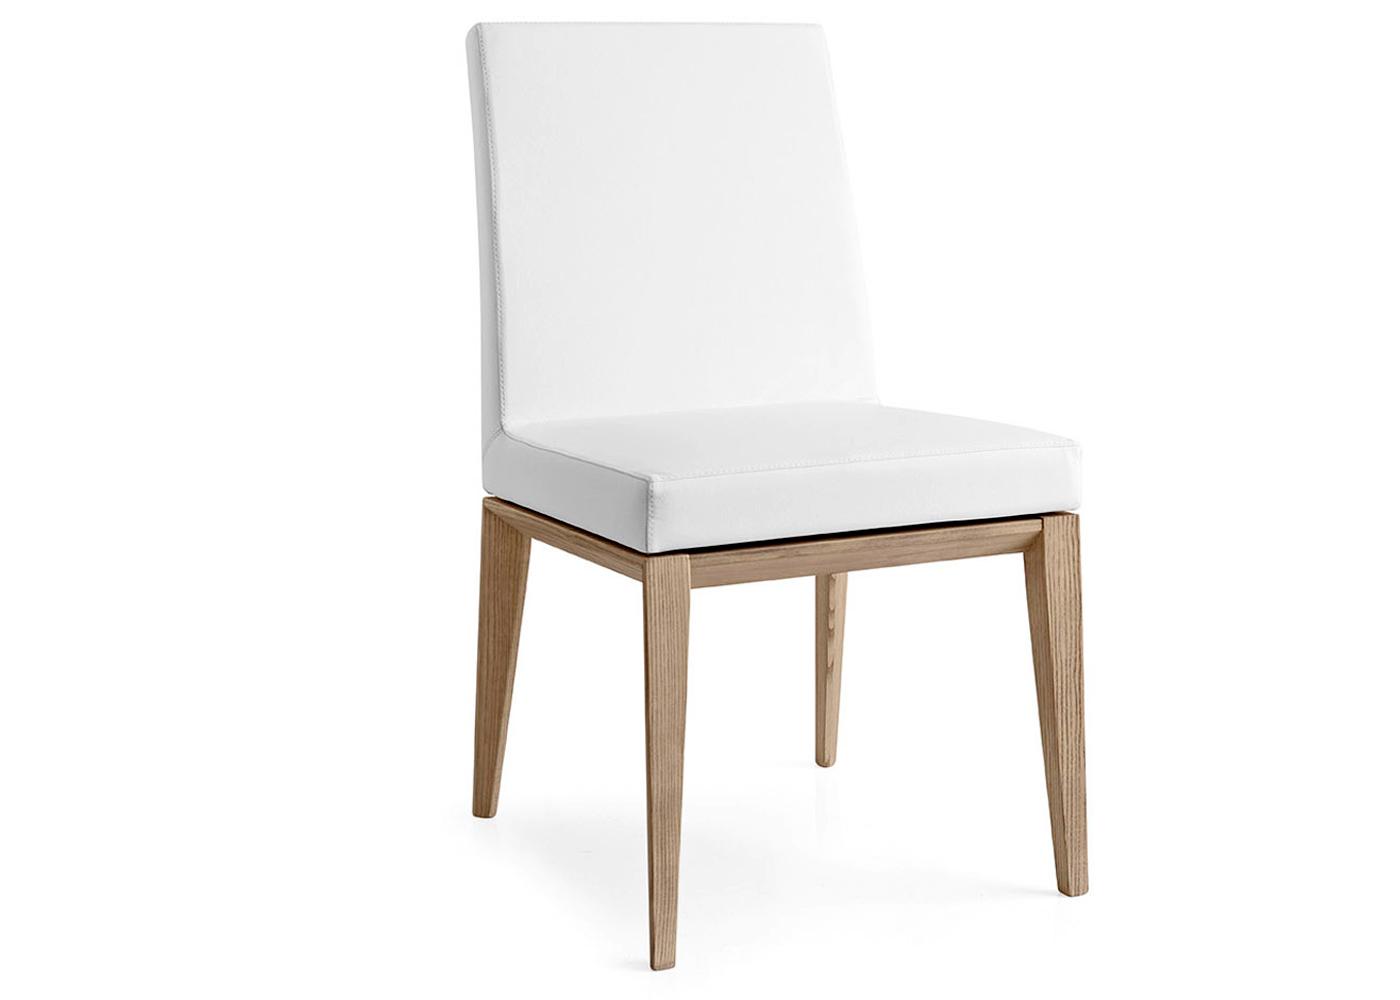 calligaris sofas uk craigslist raleigh nc bess chair midfurn furniture superstore